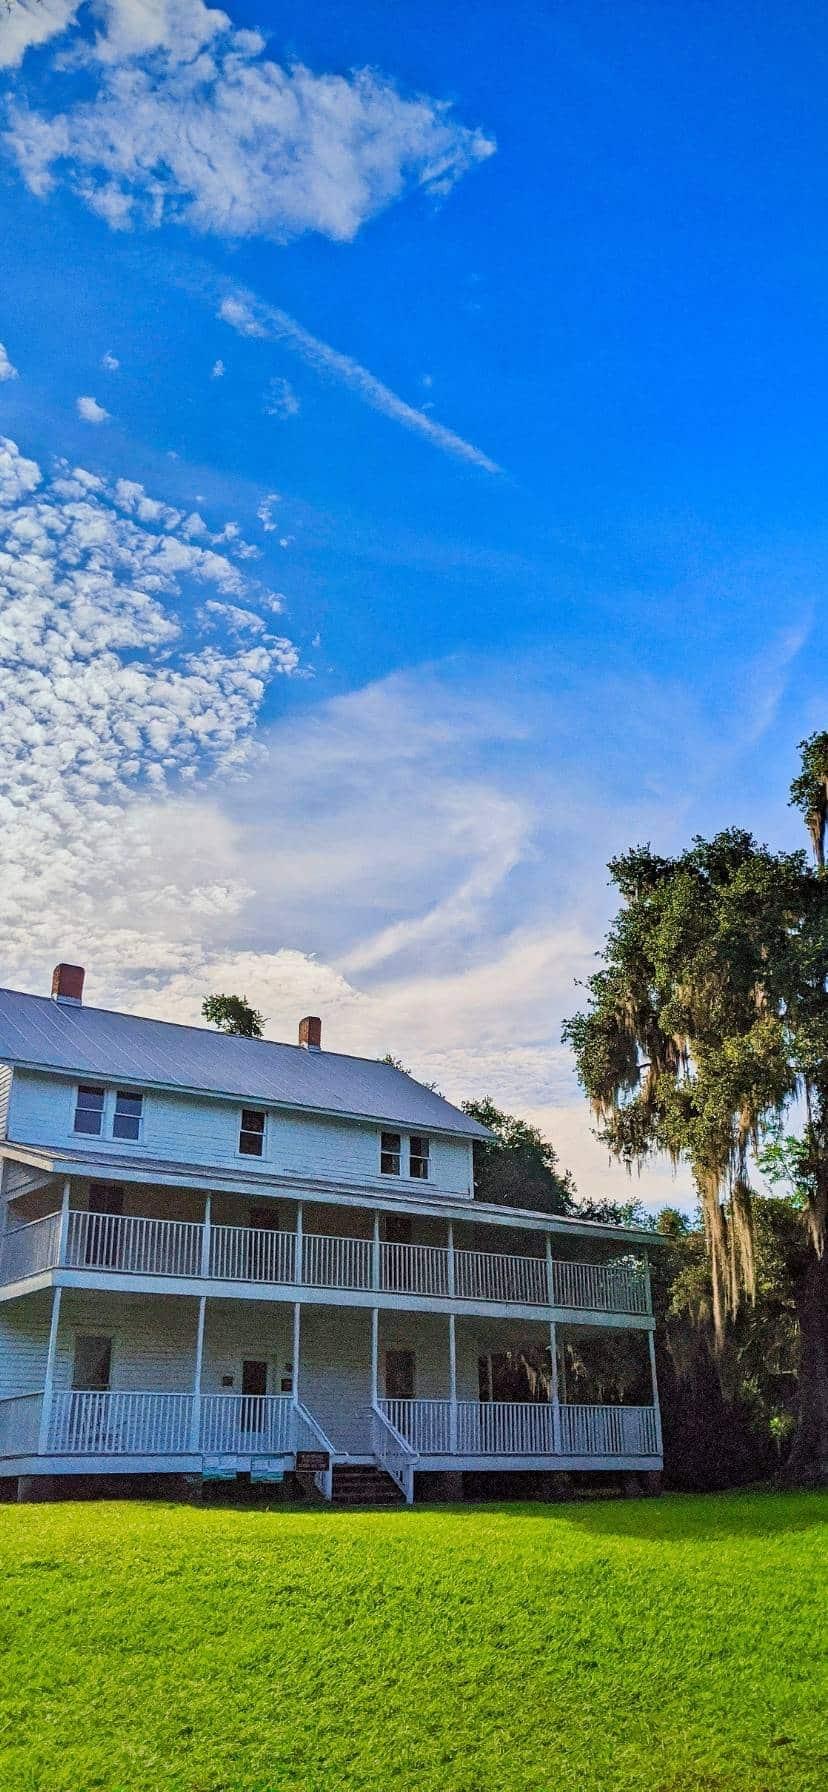 Farmhouse at Blue Spring State Park Florida